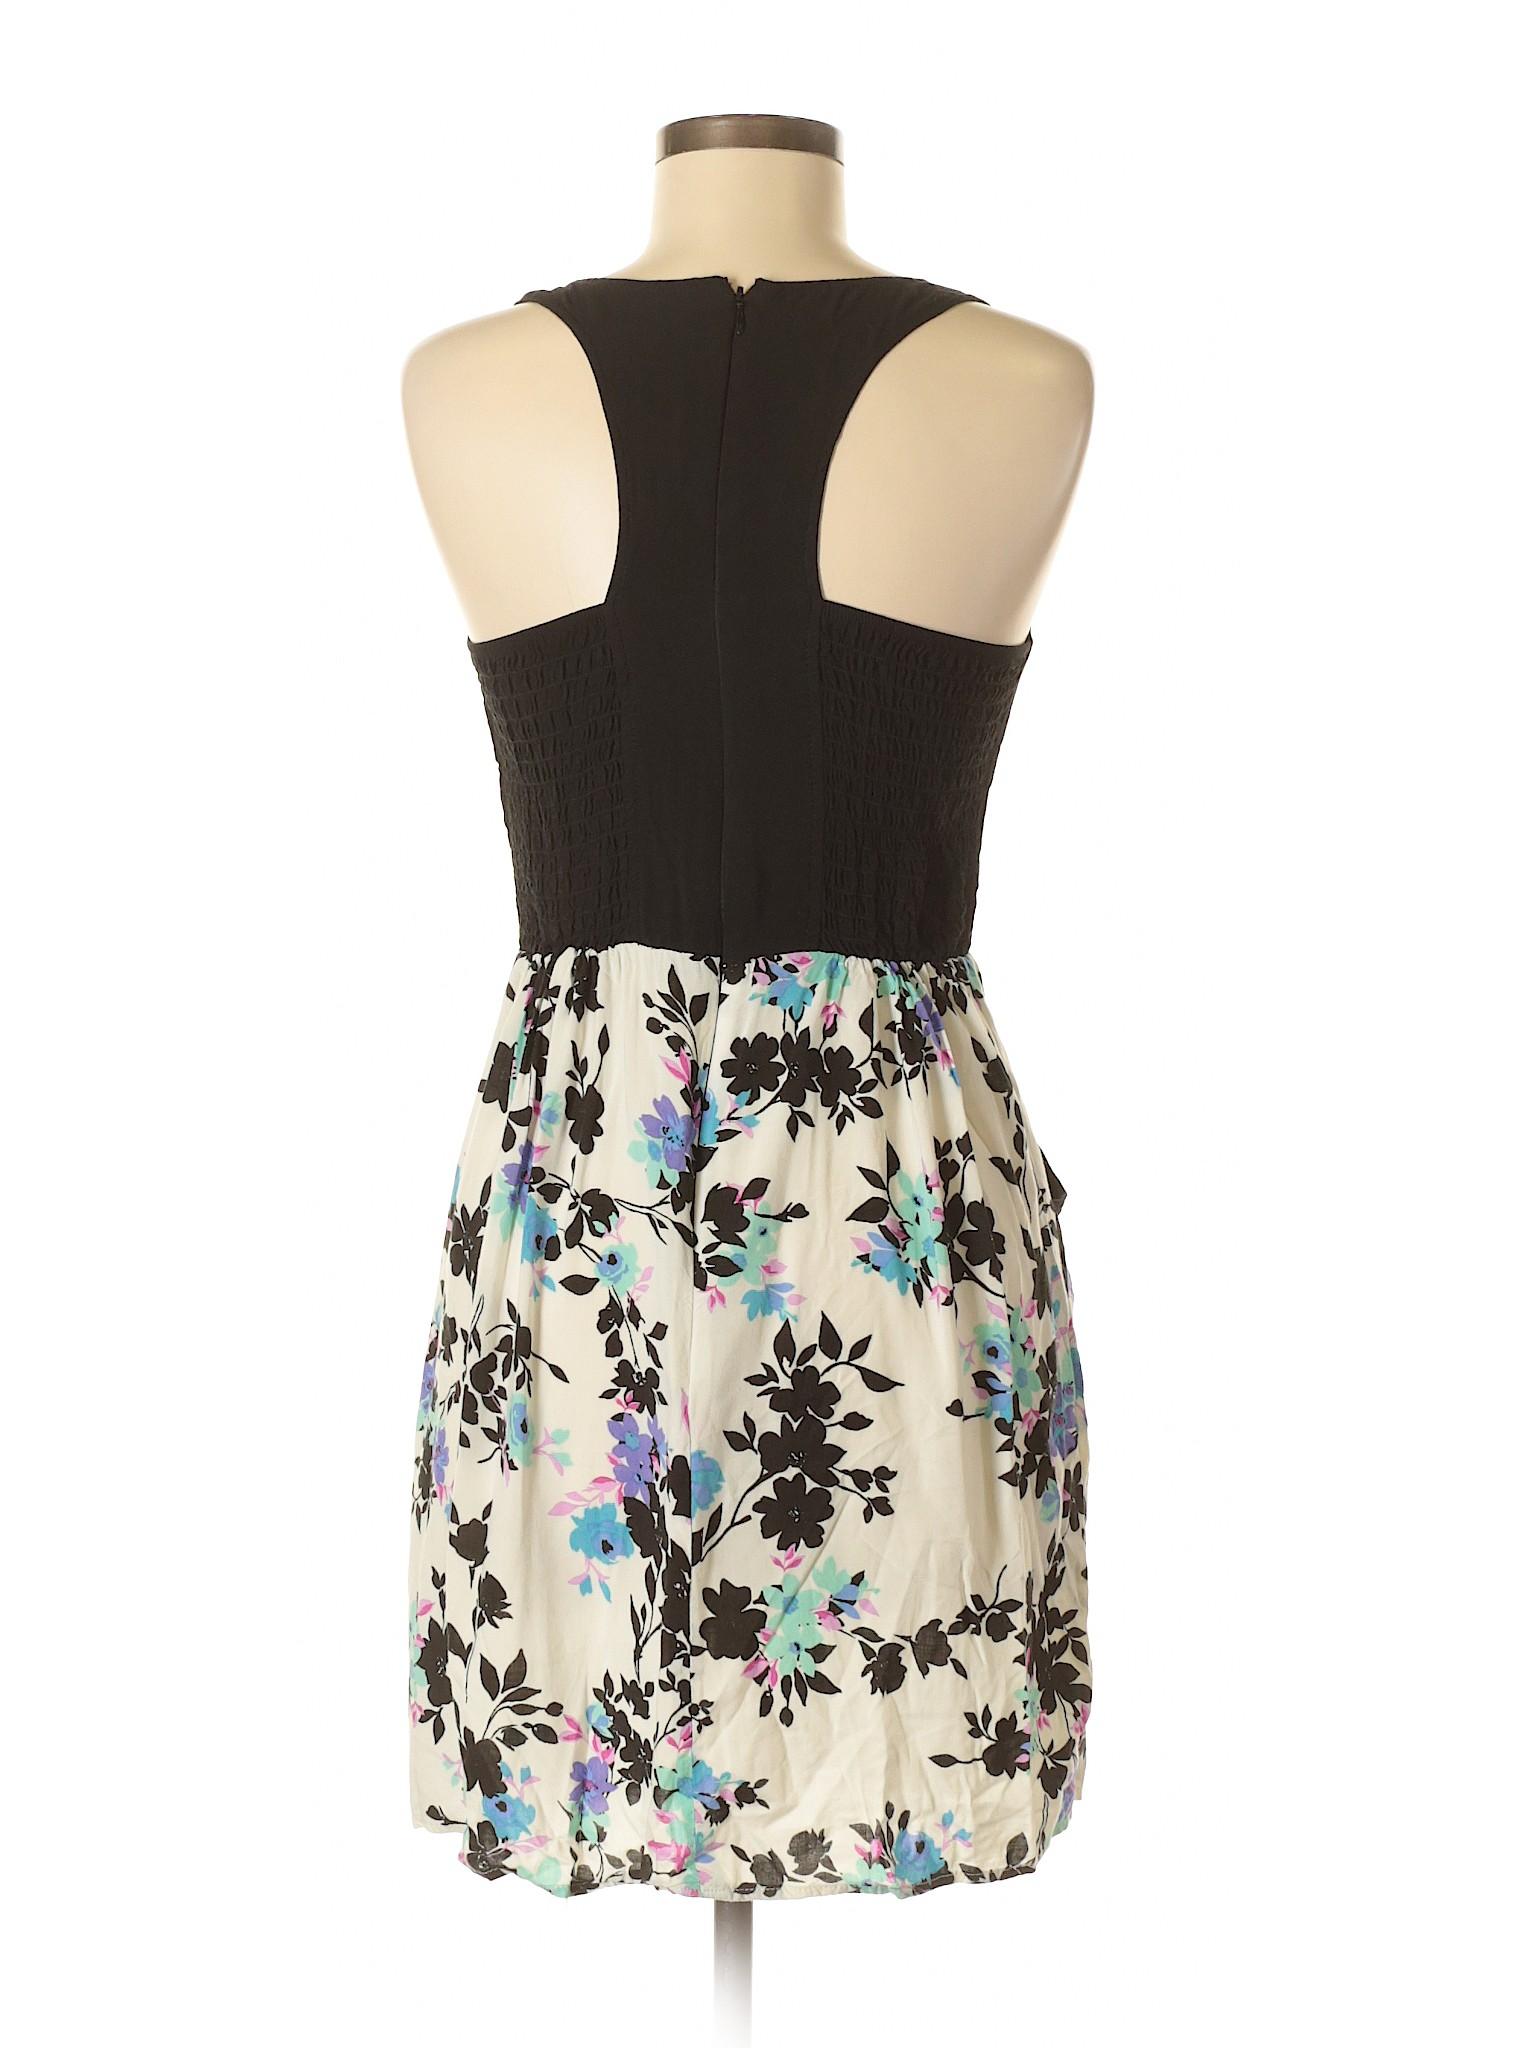 Boutique Boutique Dress Xhilaration winter Xhilaration Casual winter Casual UtxwS0q